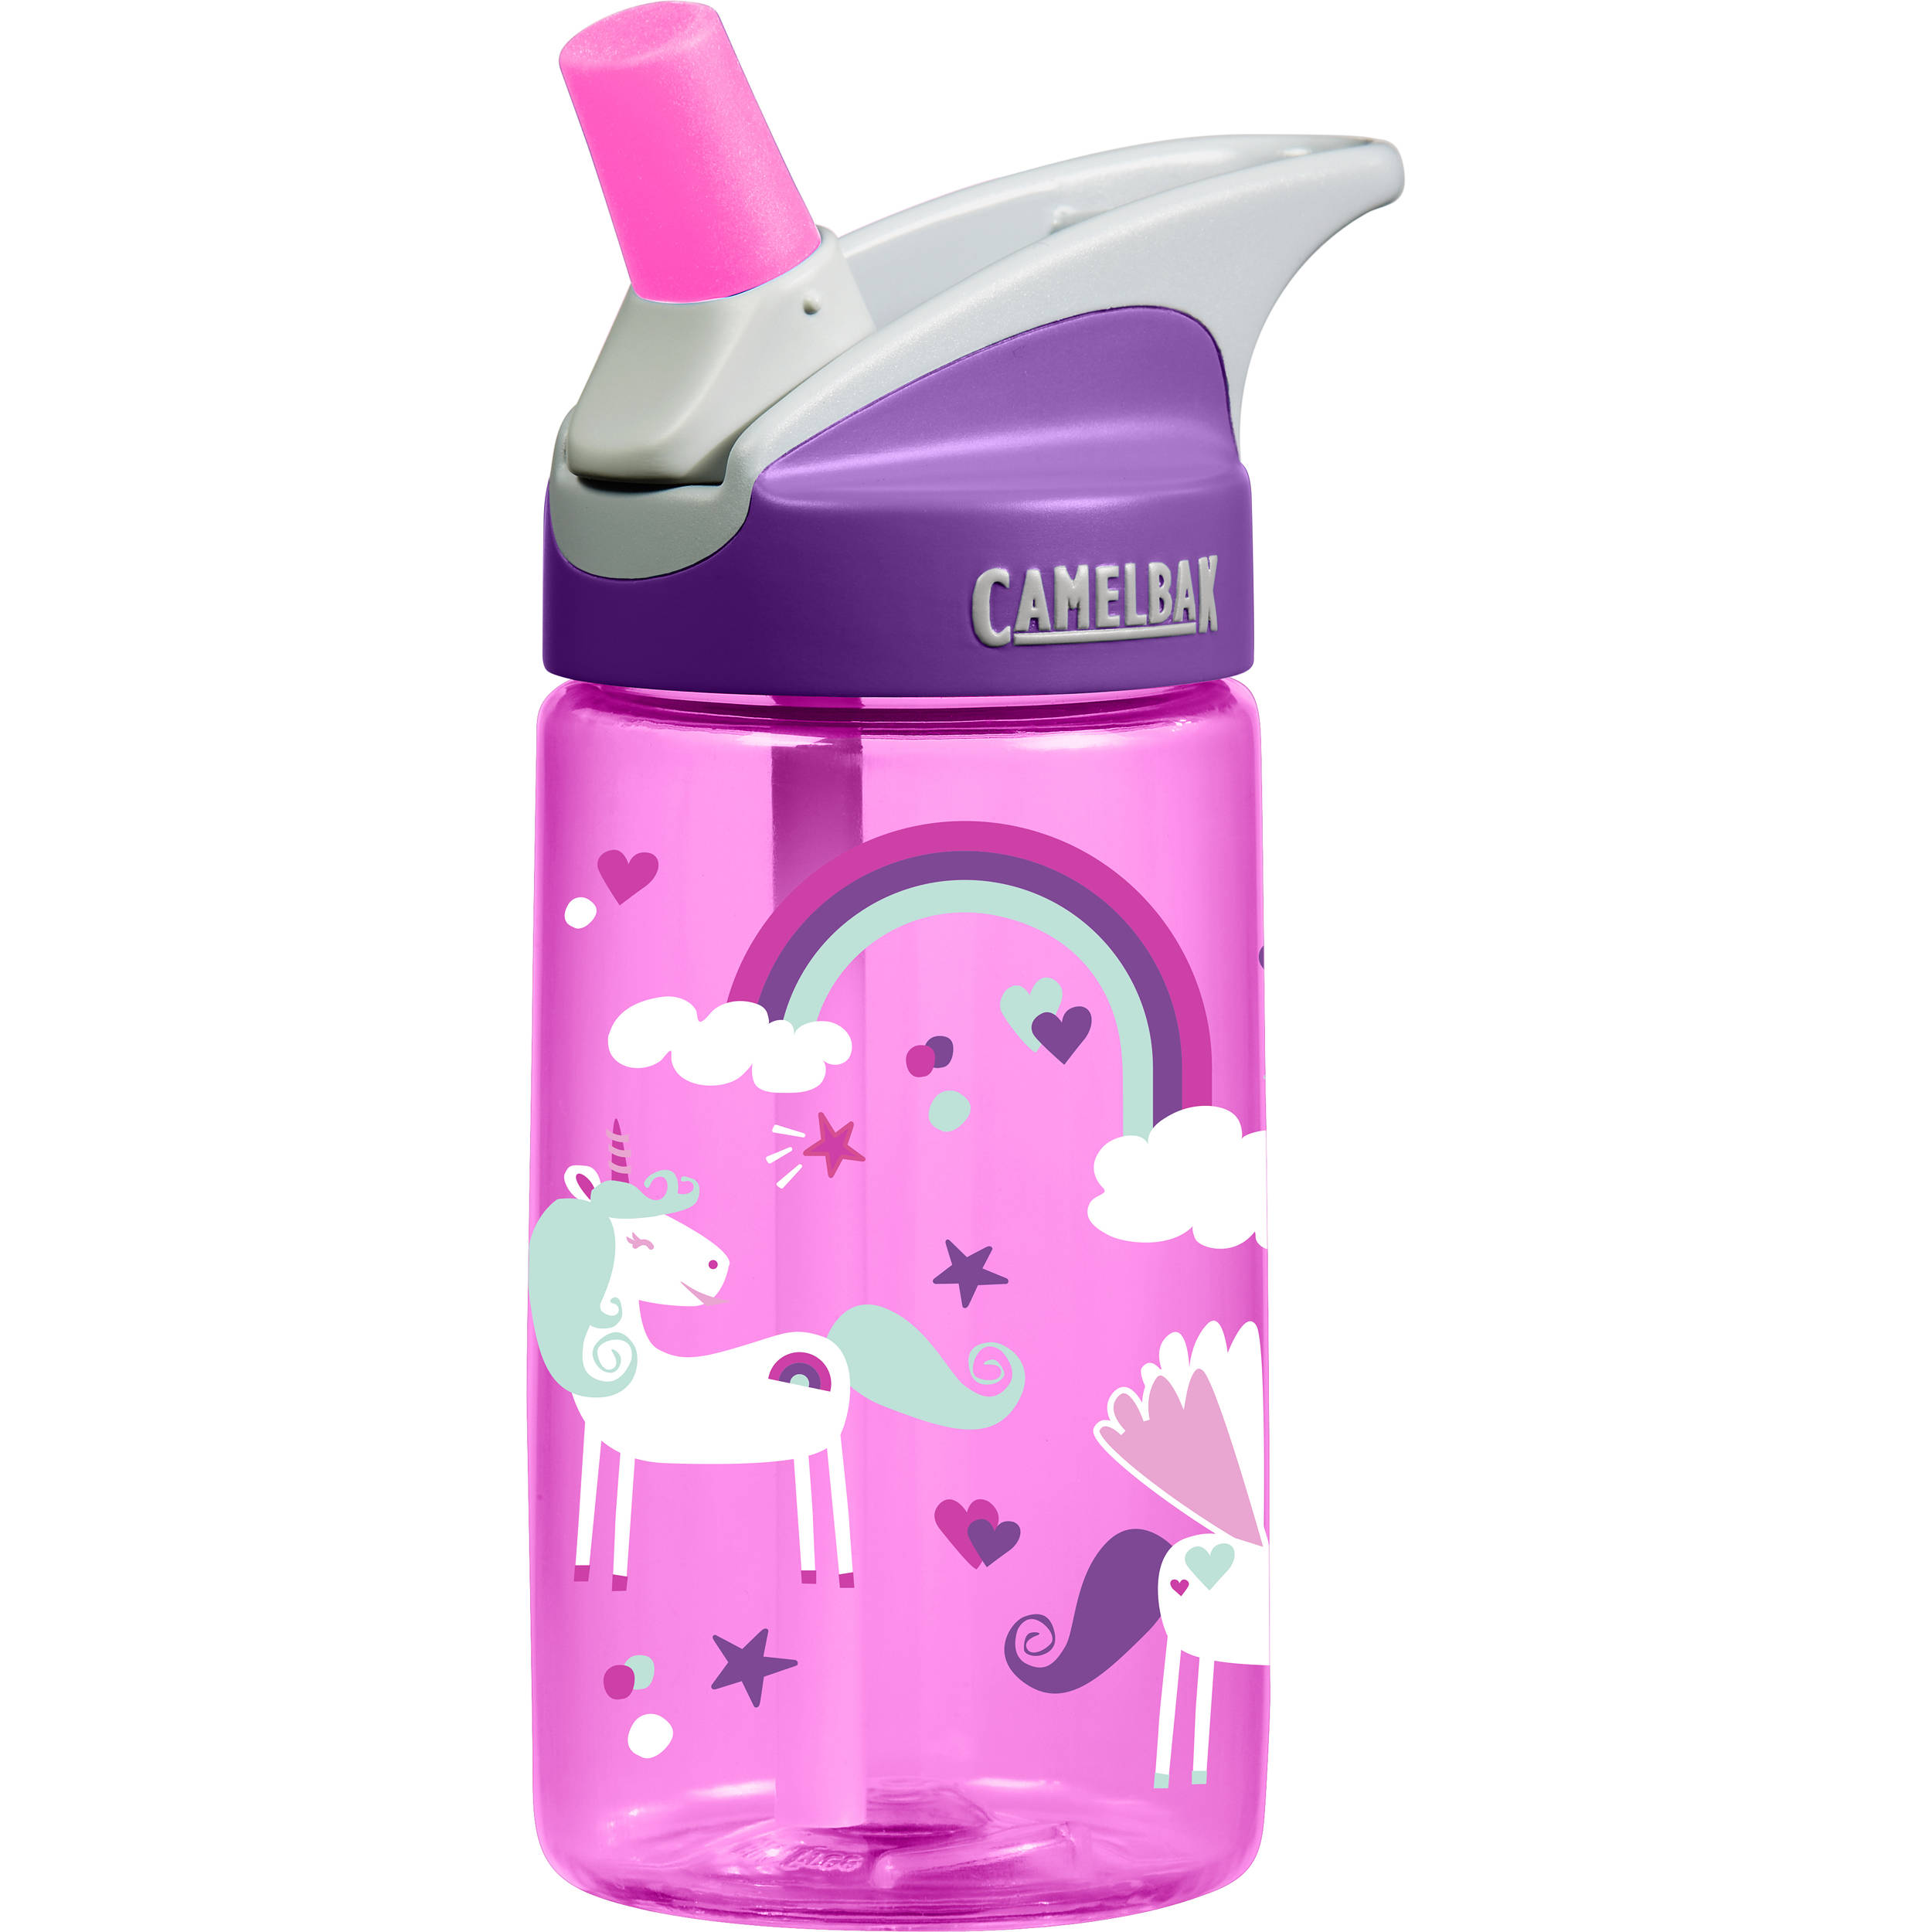 camelbak eddy kids water bottle 12 fl oz unicorns 53861 b u0026h